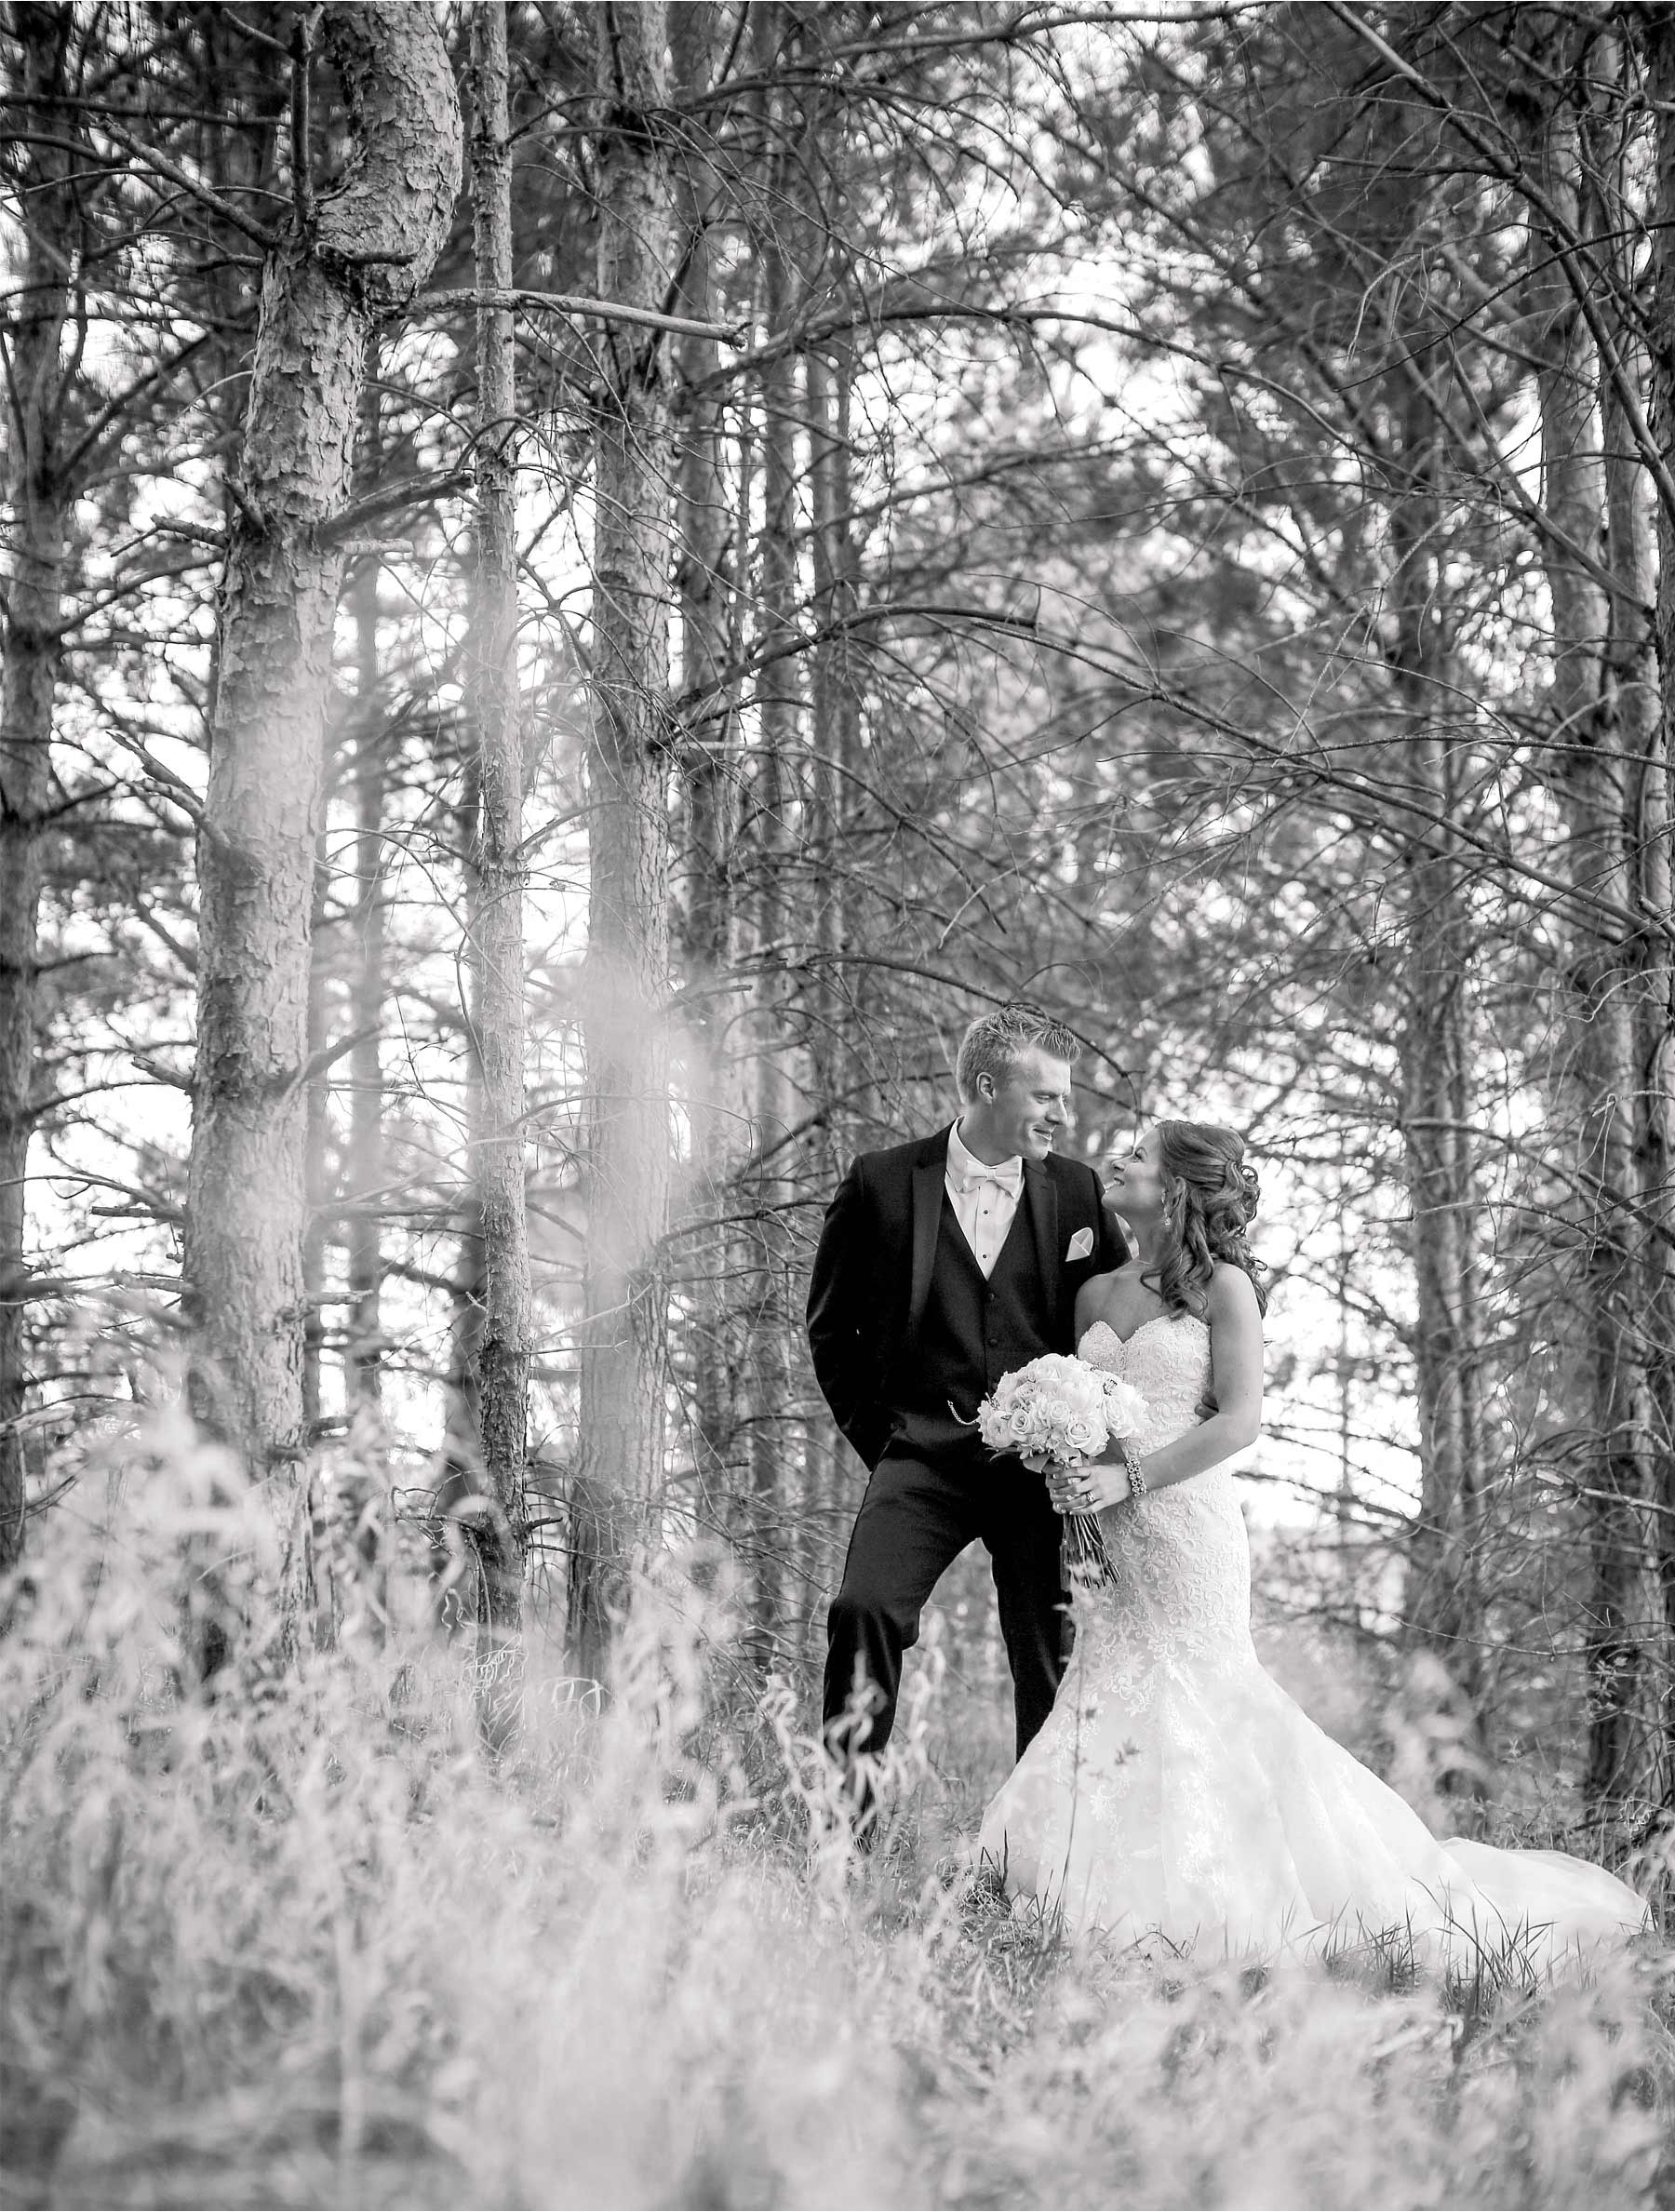 03-Minneapolis-Minnesota-Wedding-Photography-by-Vick-Photography-First-Look-Tianna-&-Matt.jpg